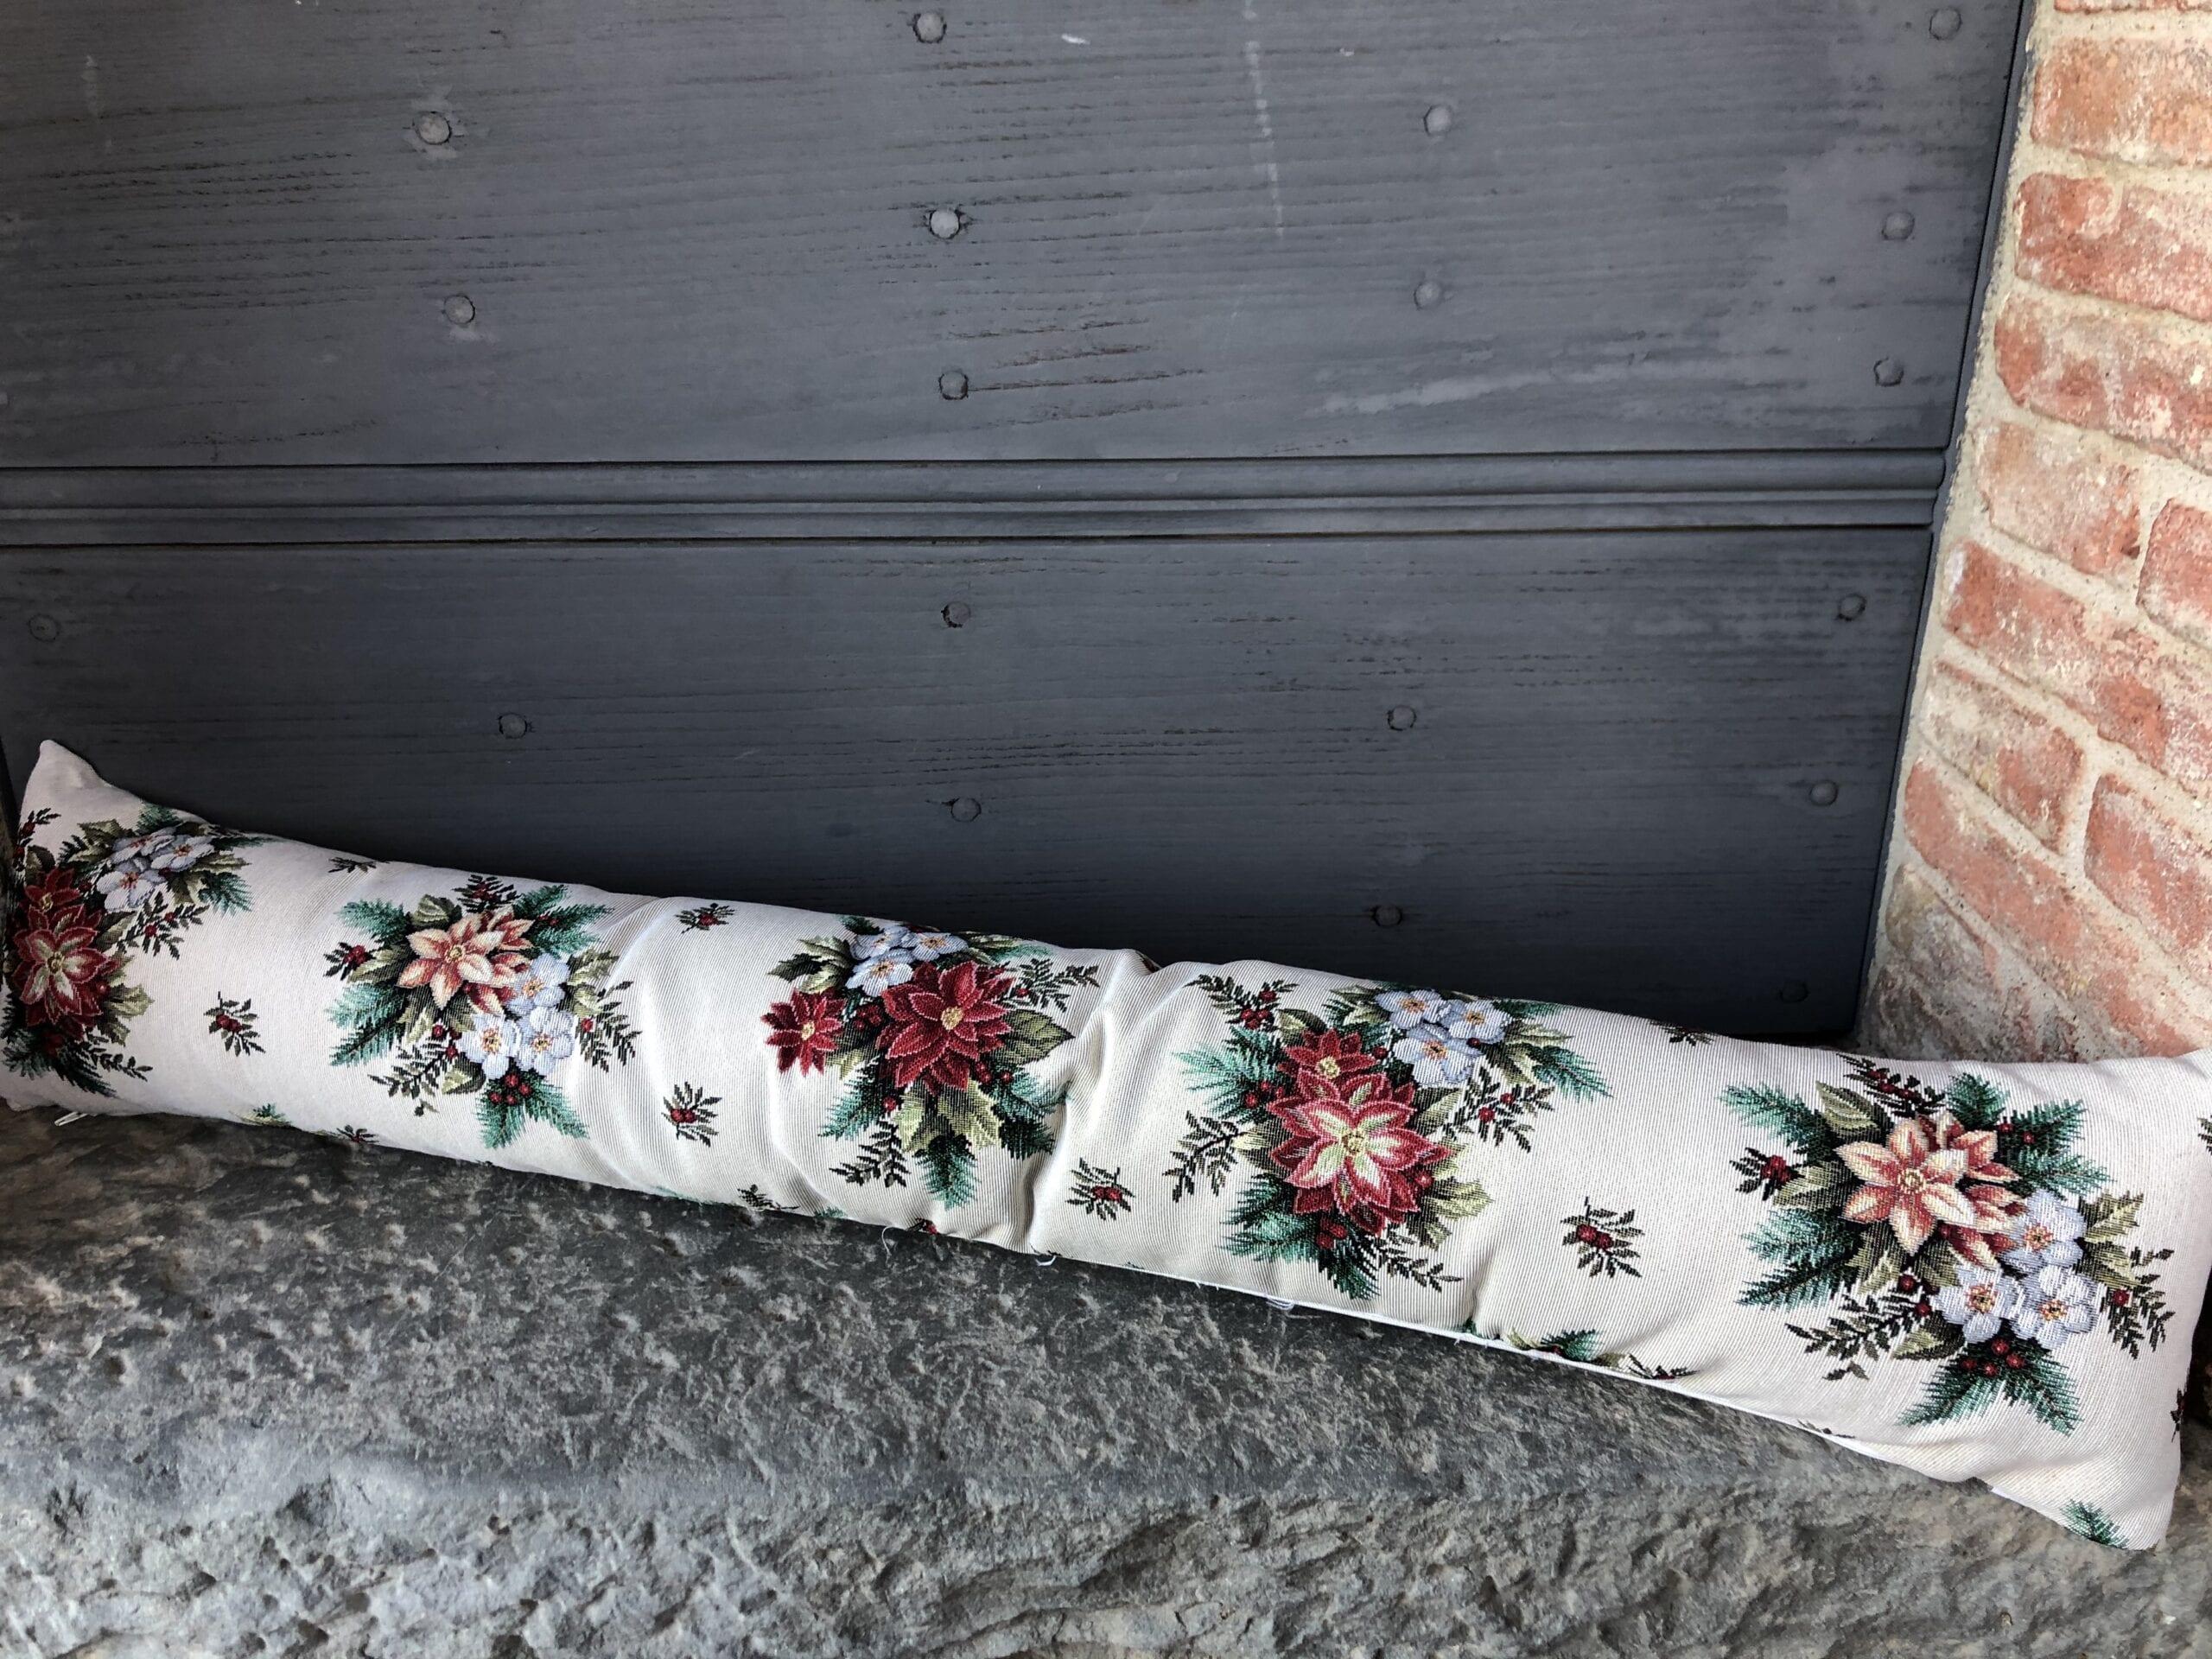 Paraspifferi – Fiori ed agrifogli